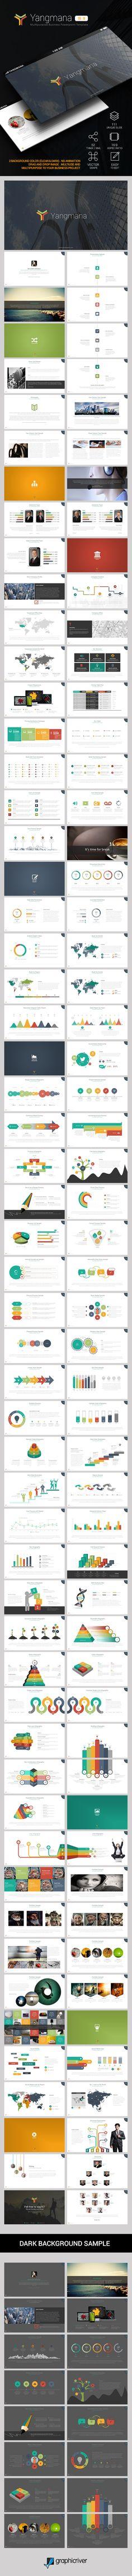 Yangmana - Powerpoint Template